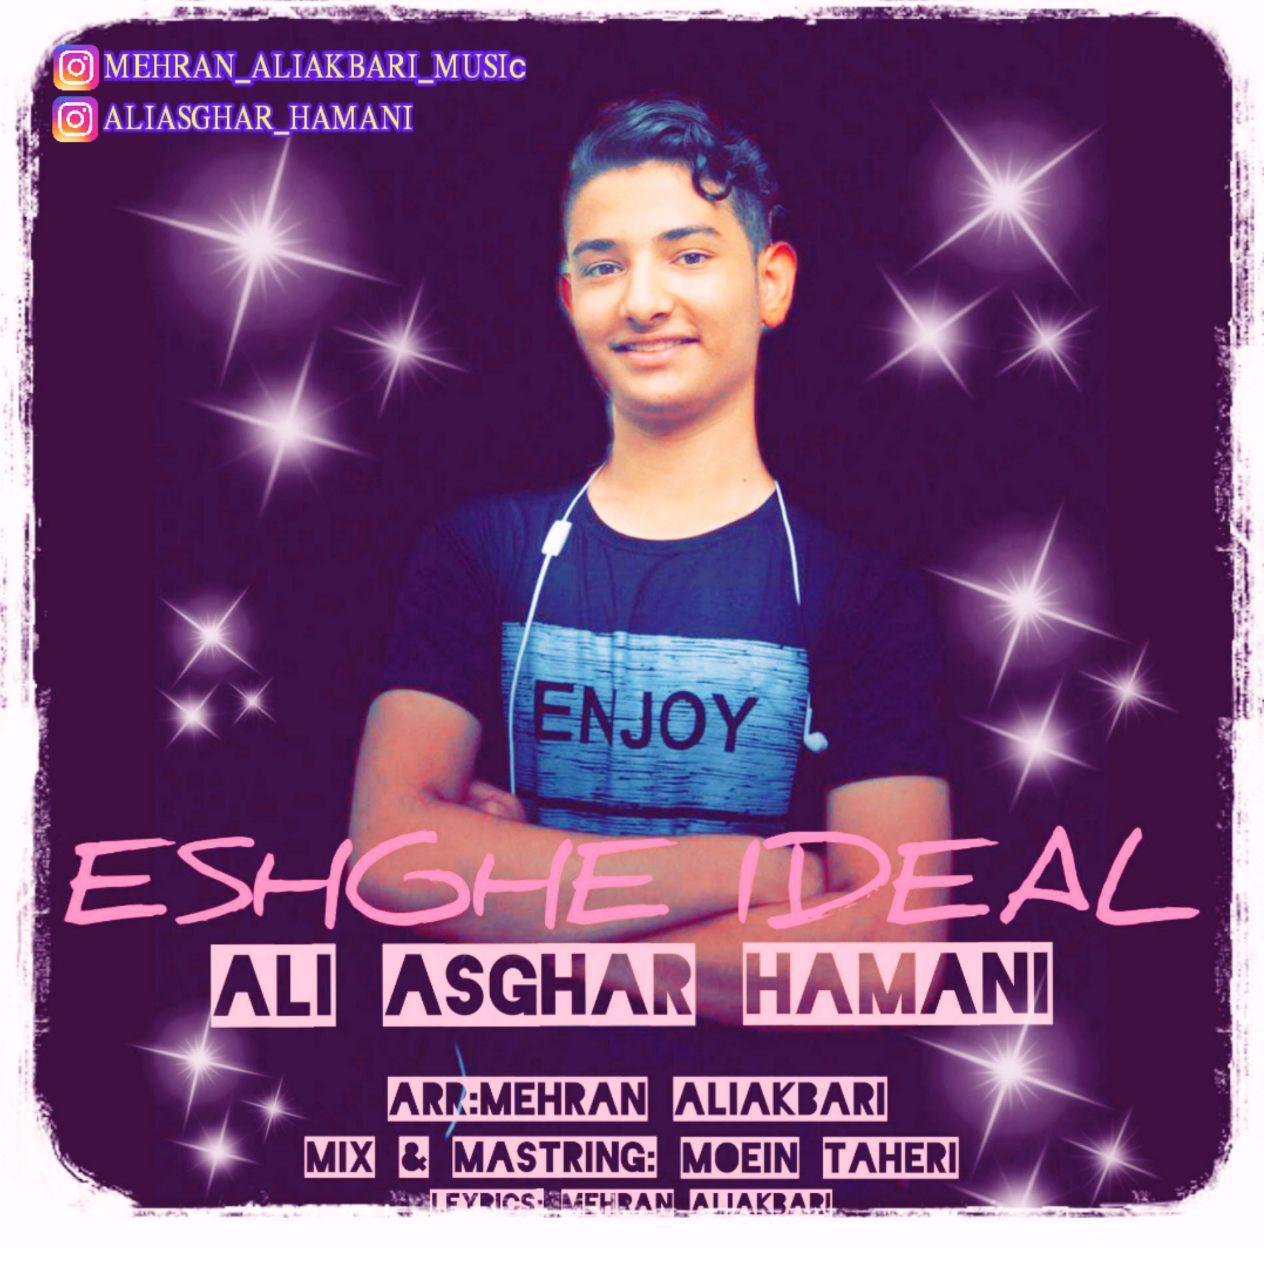 Ali Asghar Hamani – Eshghe Ideal